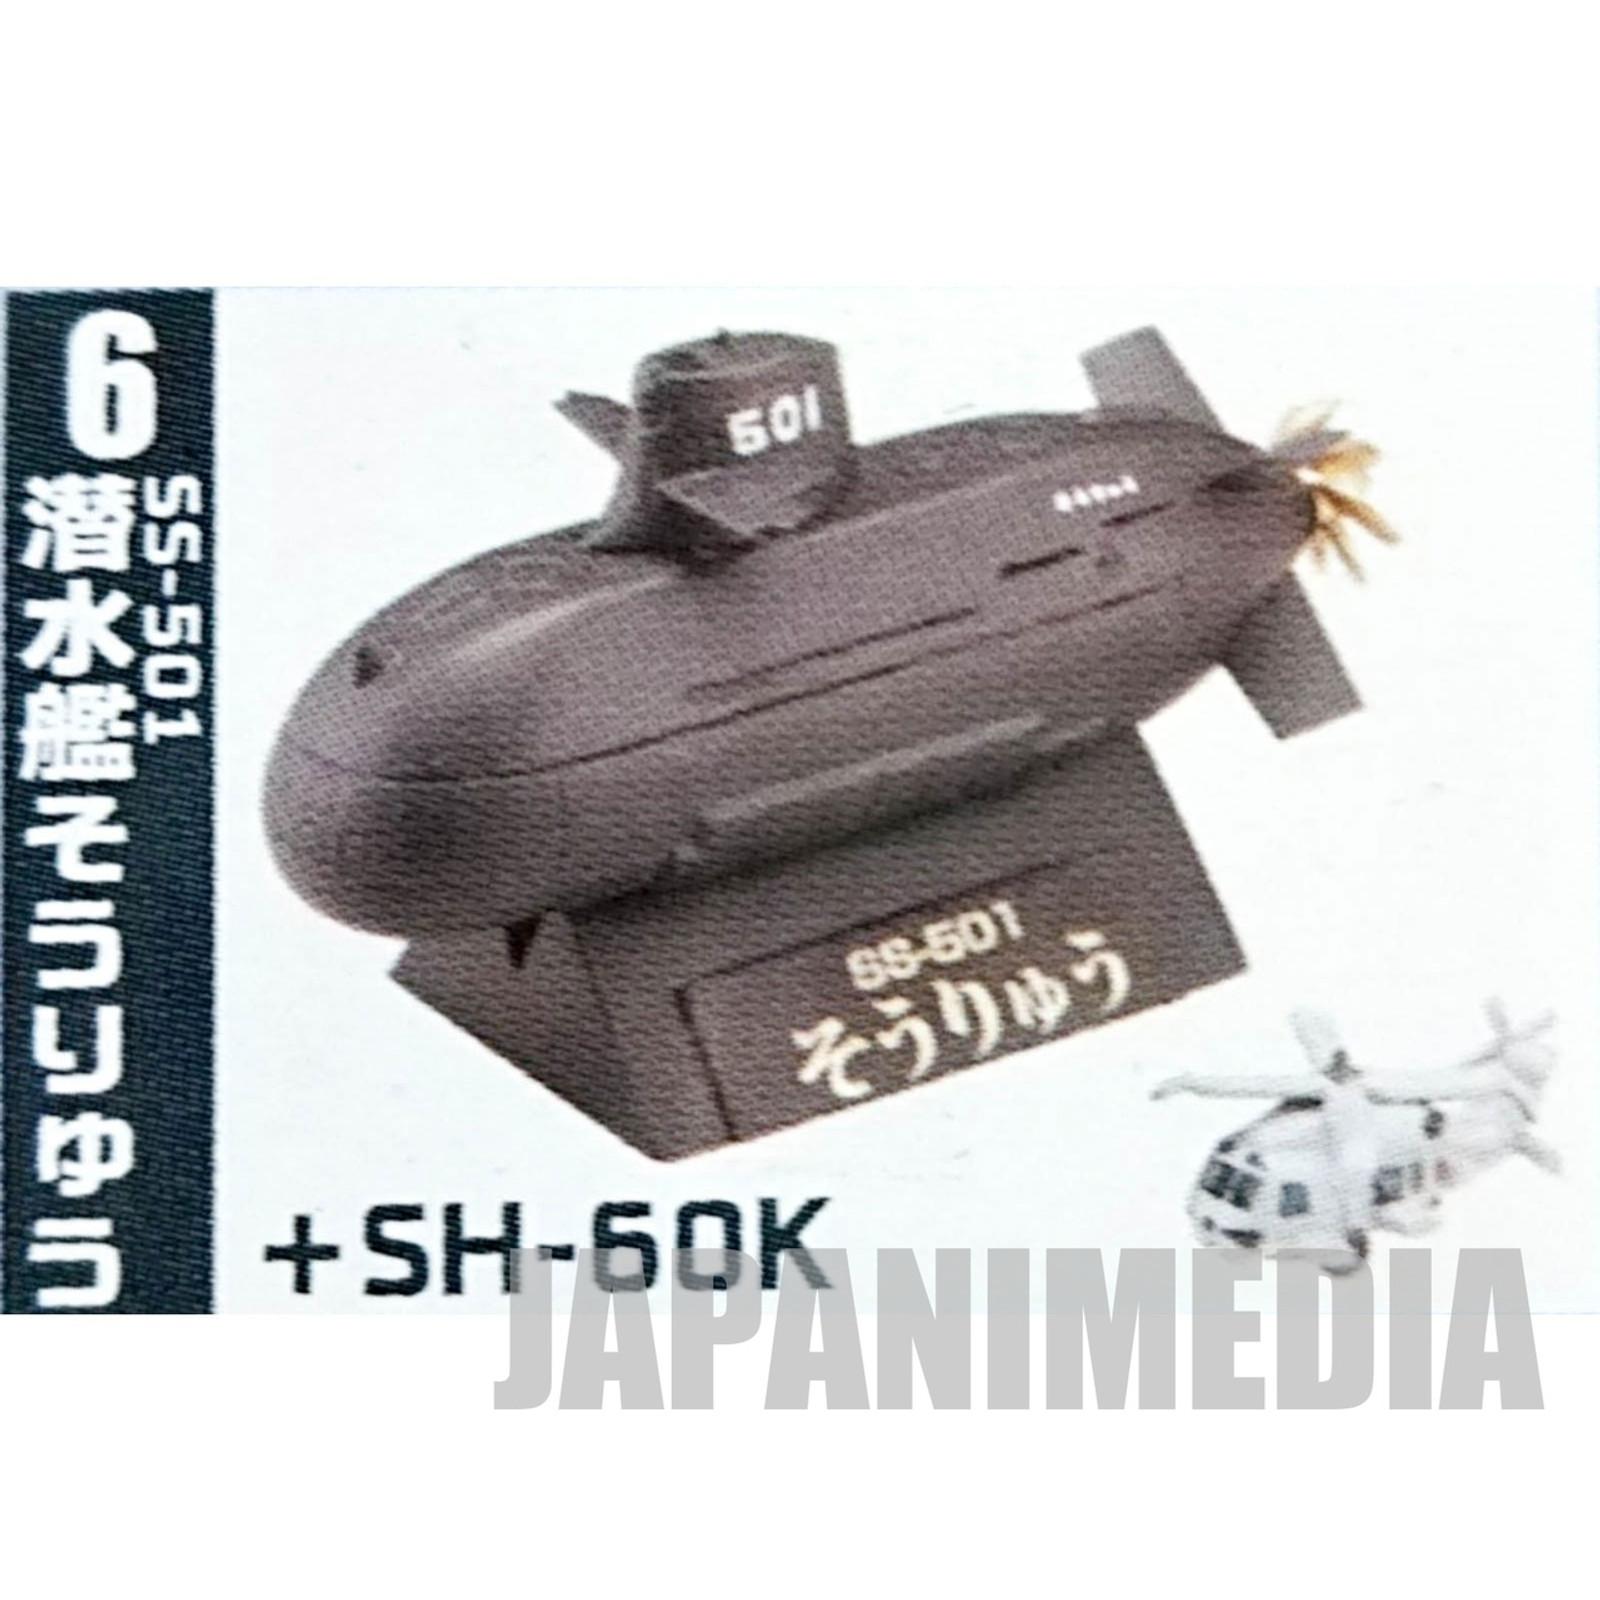 Chibi Scale Submarine Soryu Type SS-501 + SH-60K Miniature Figure Kaiyodo F-Toys JAPAN